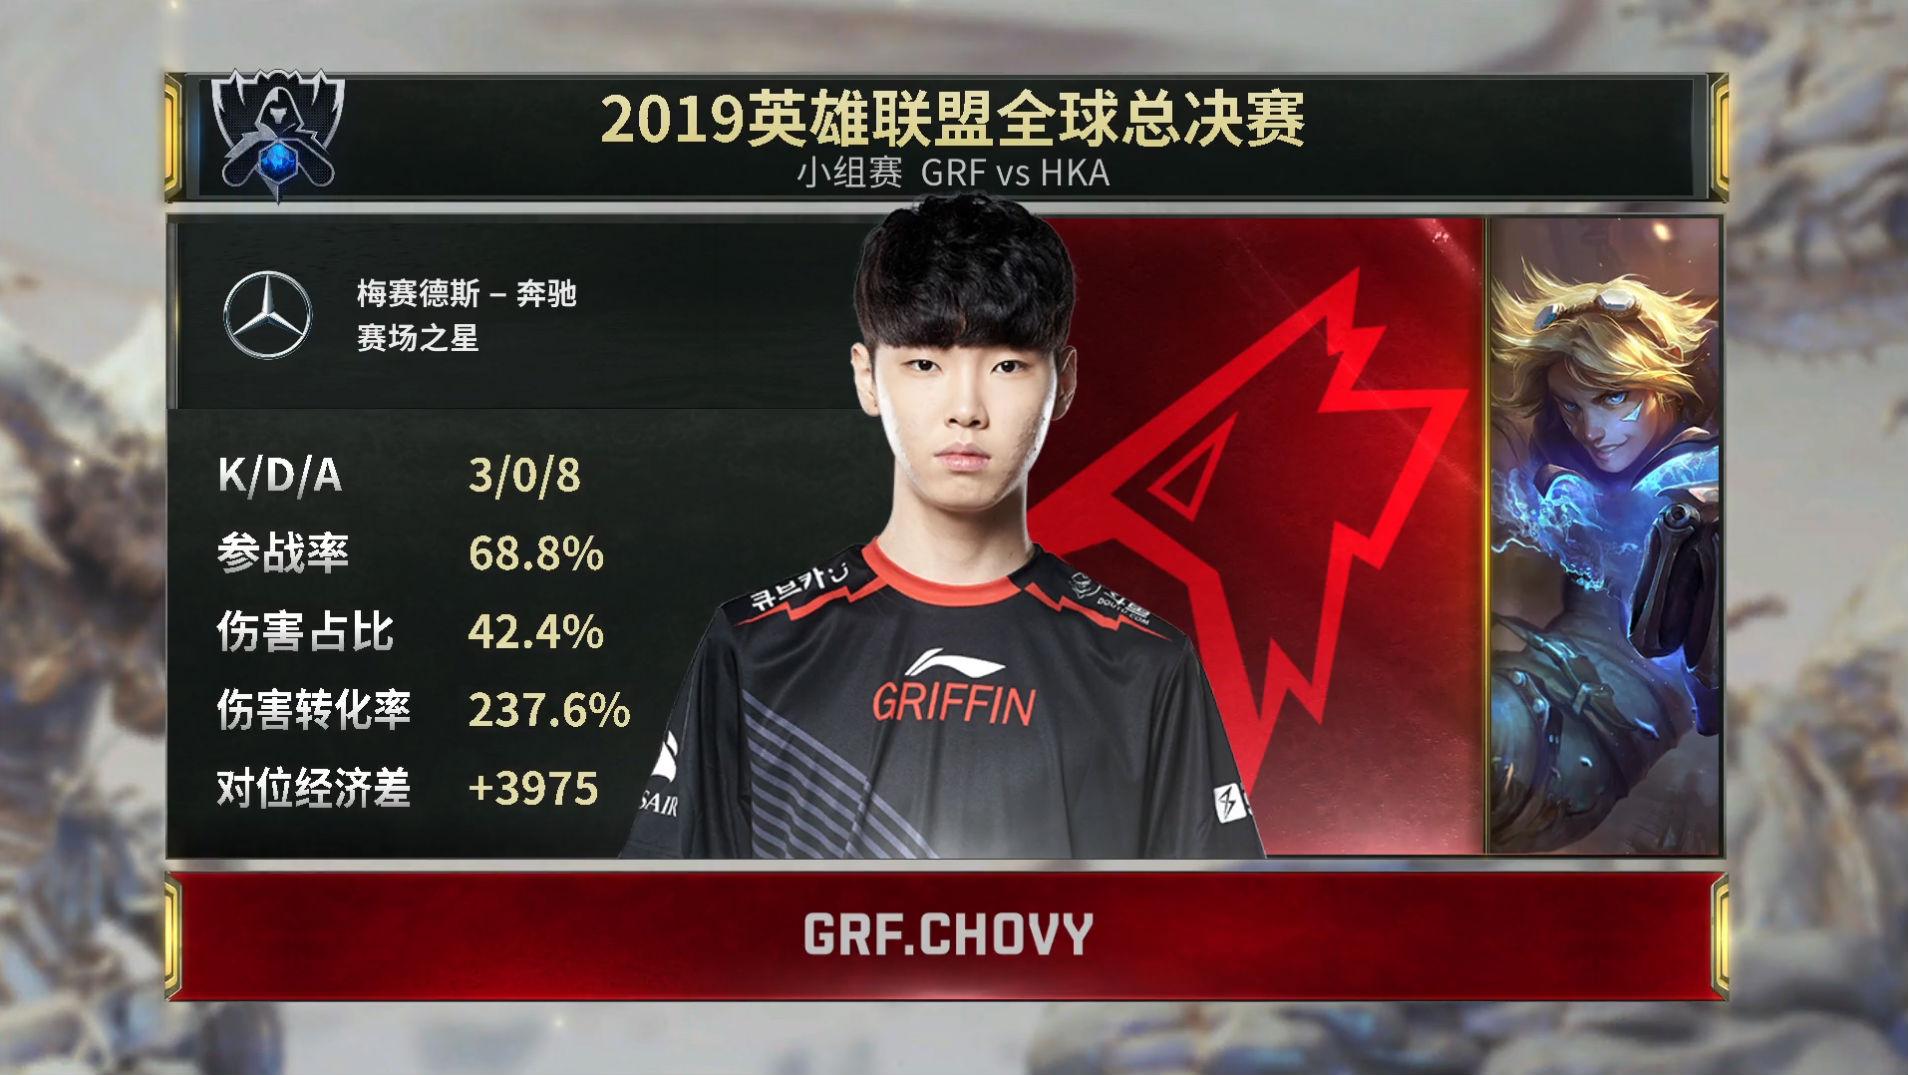 【战报】Chovy无解Carry,GRF击败HKA拿到首胜